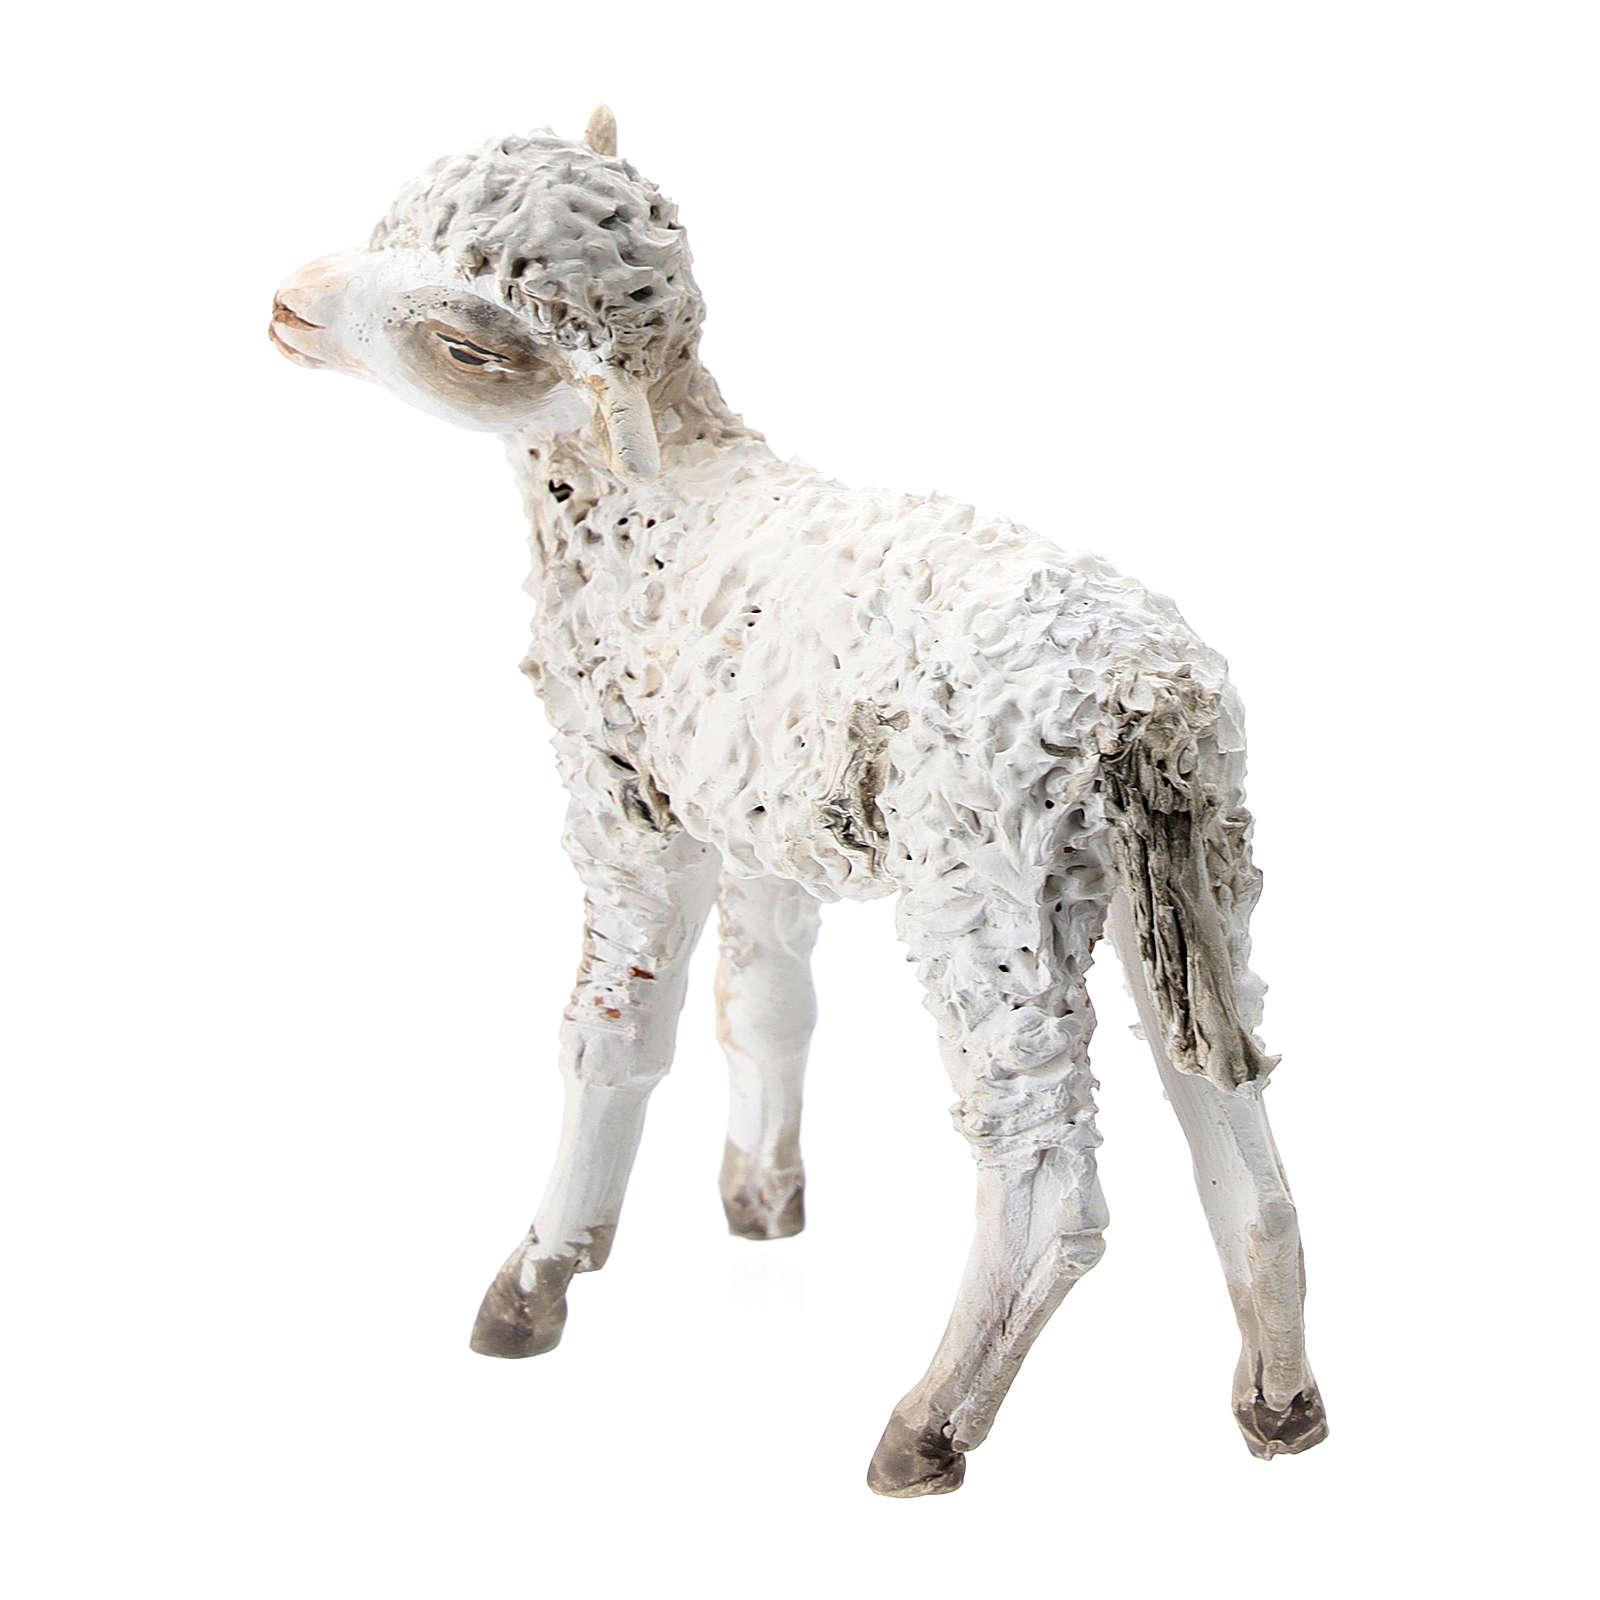 Nativity scene figurine, Standing sheep by Angela Tripi 30 cm 4